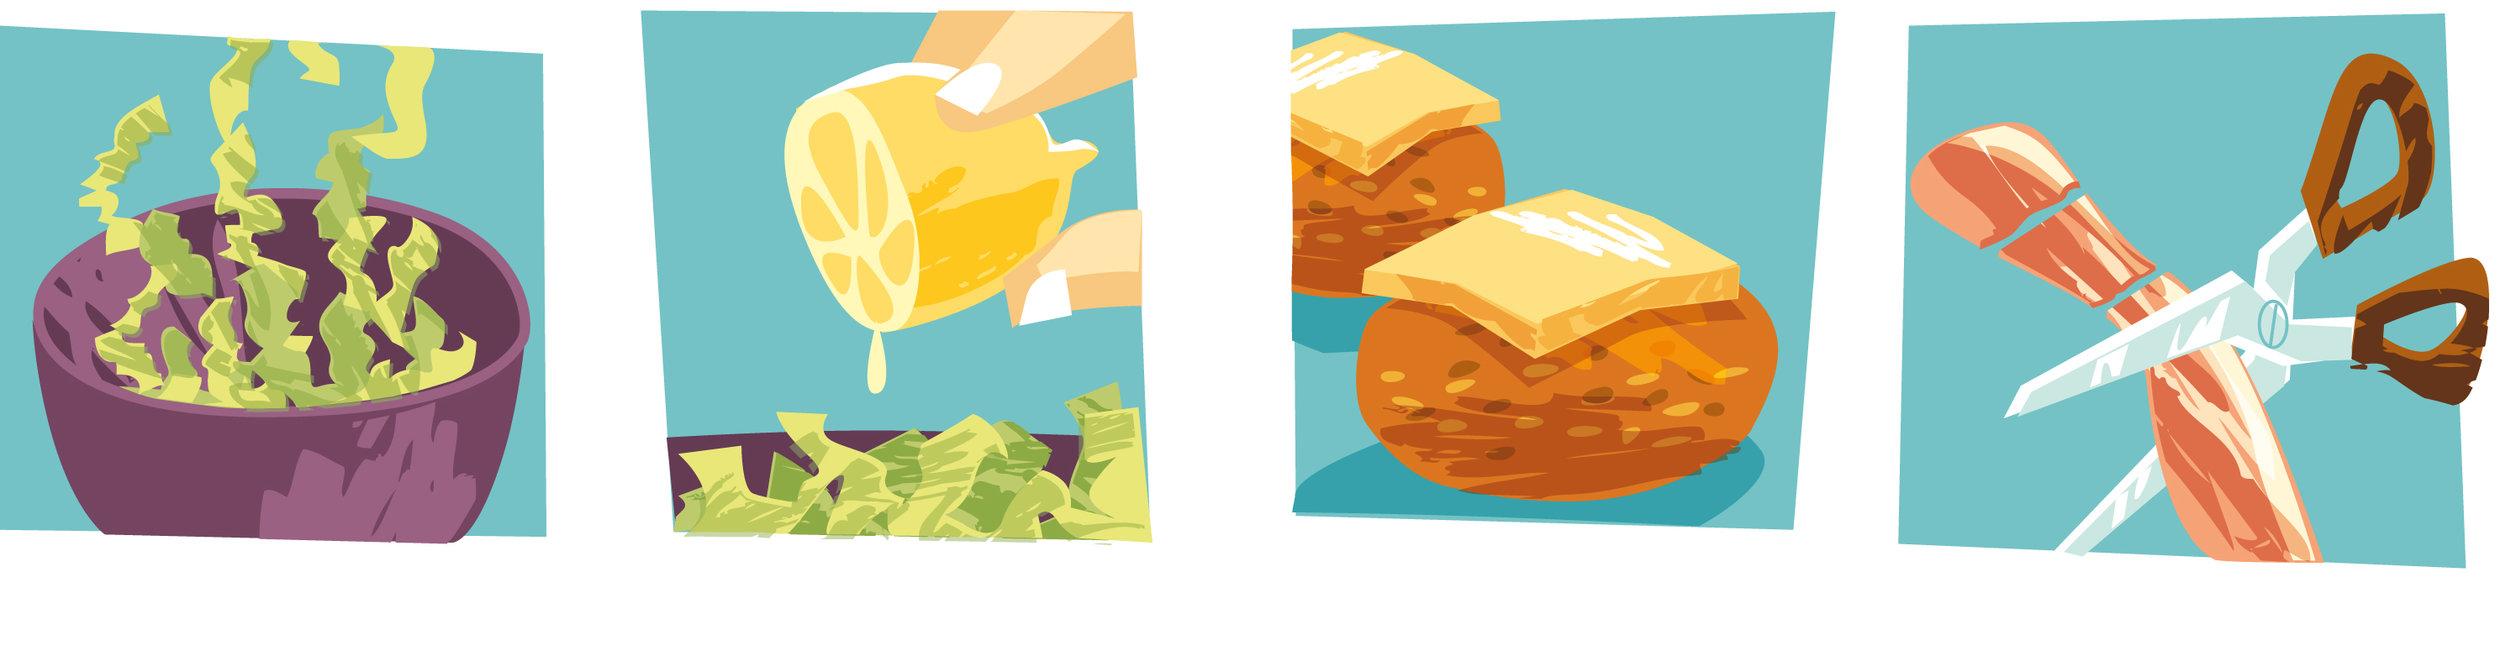 Lettuce lemon pattie cheese bacon illustration-Dean Gorissen.jpg